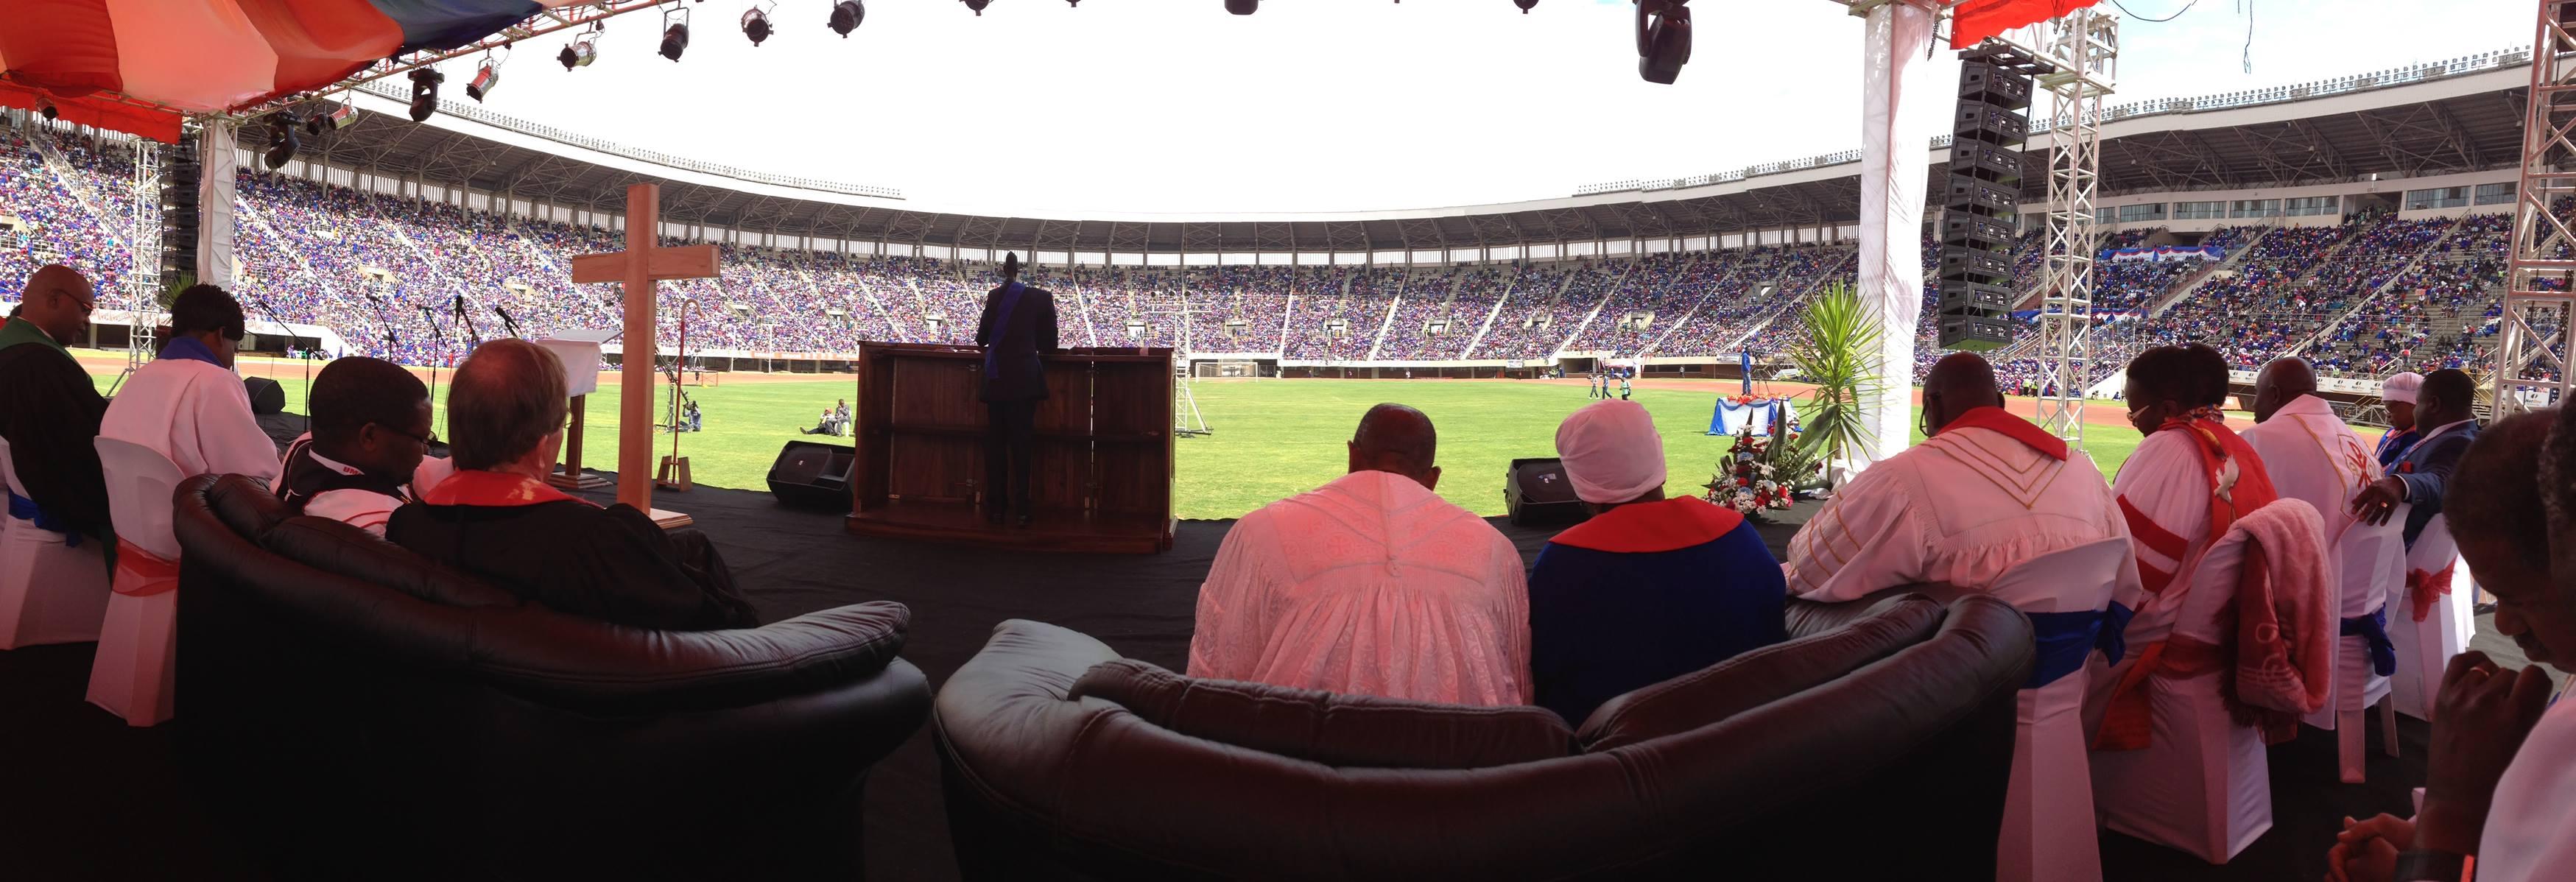 At least 55,000 United Methodists gathered at the Ebenezer Convention held in Harare, Zimbabwe. Photo by Maidstone Mulenga